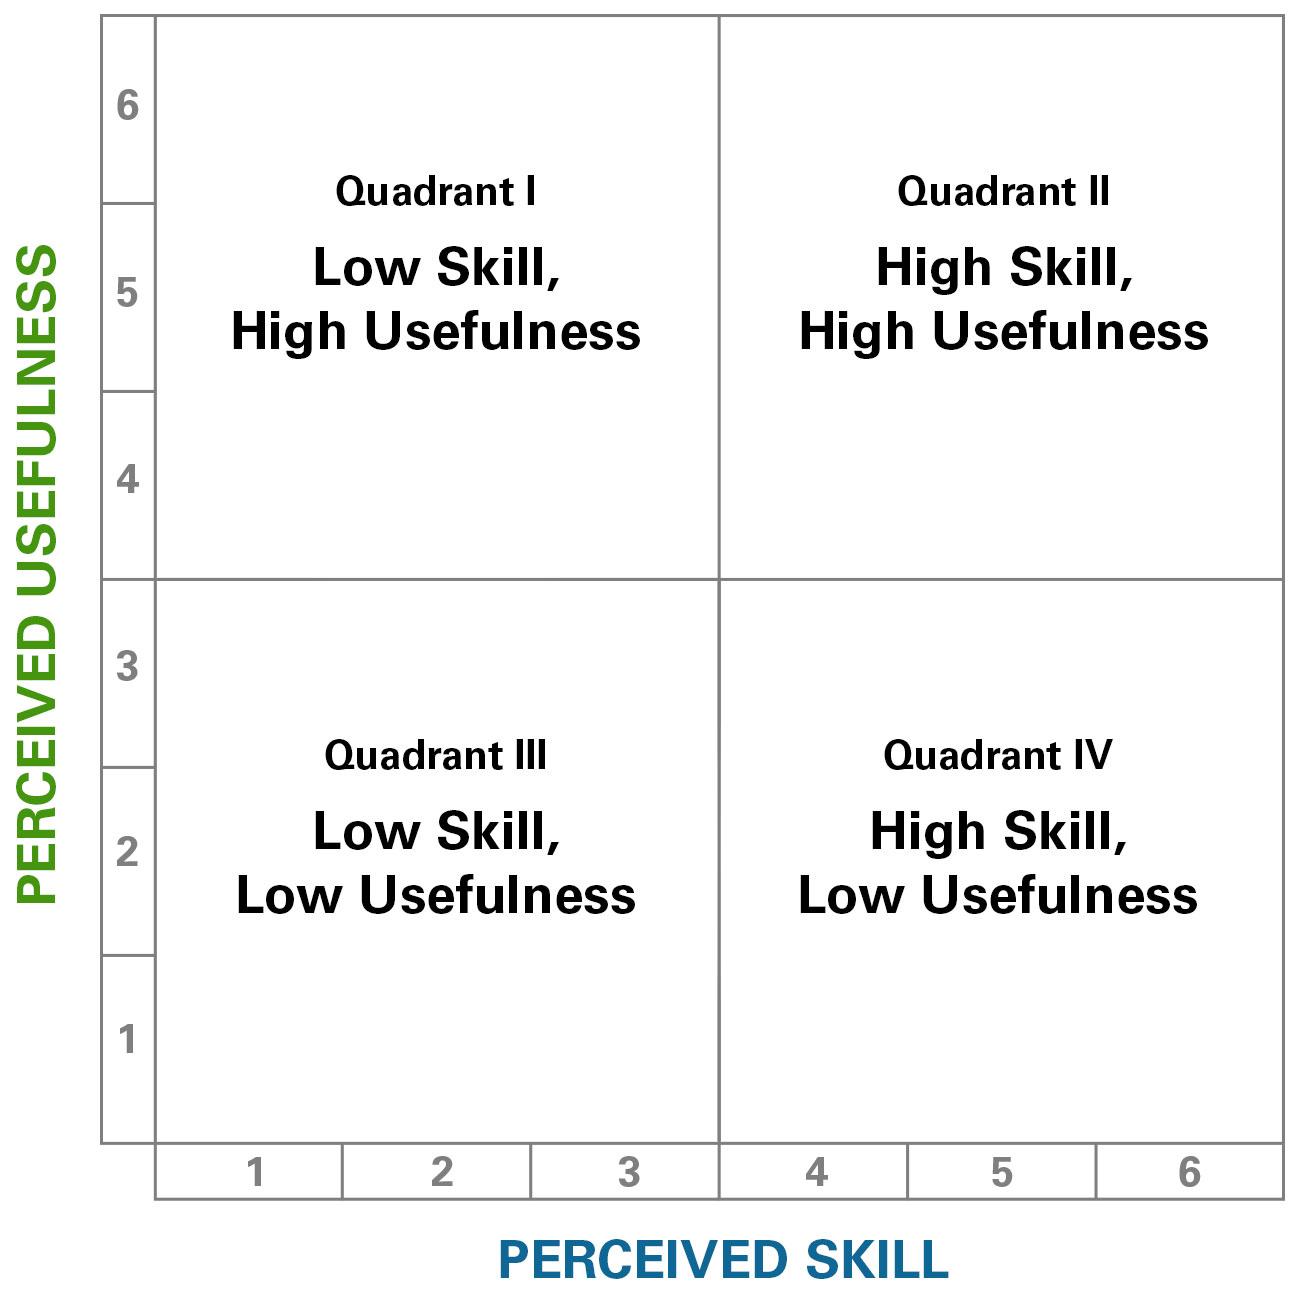 skill and usefulness quadrants illustration